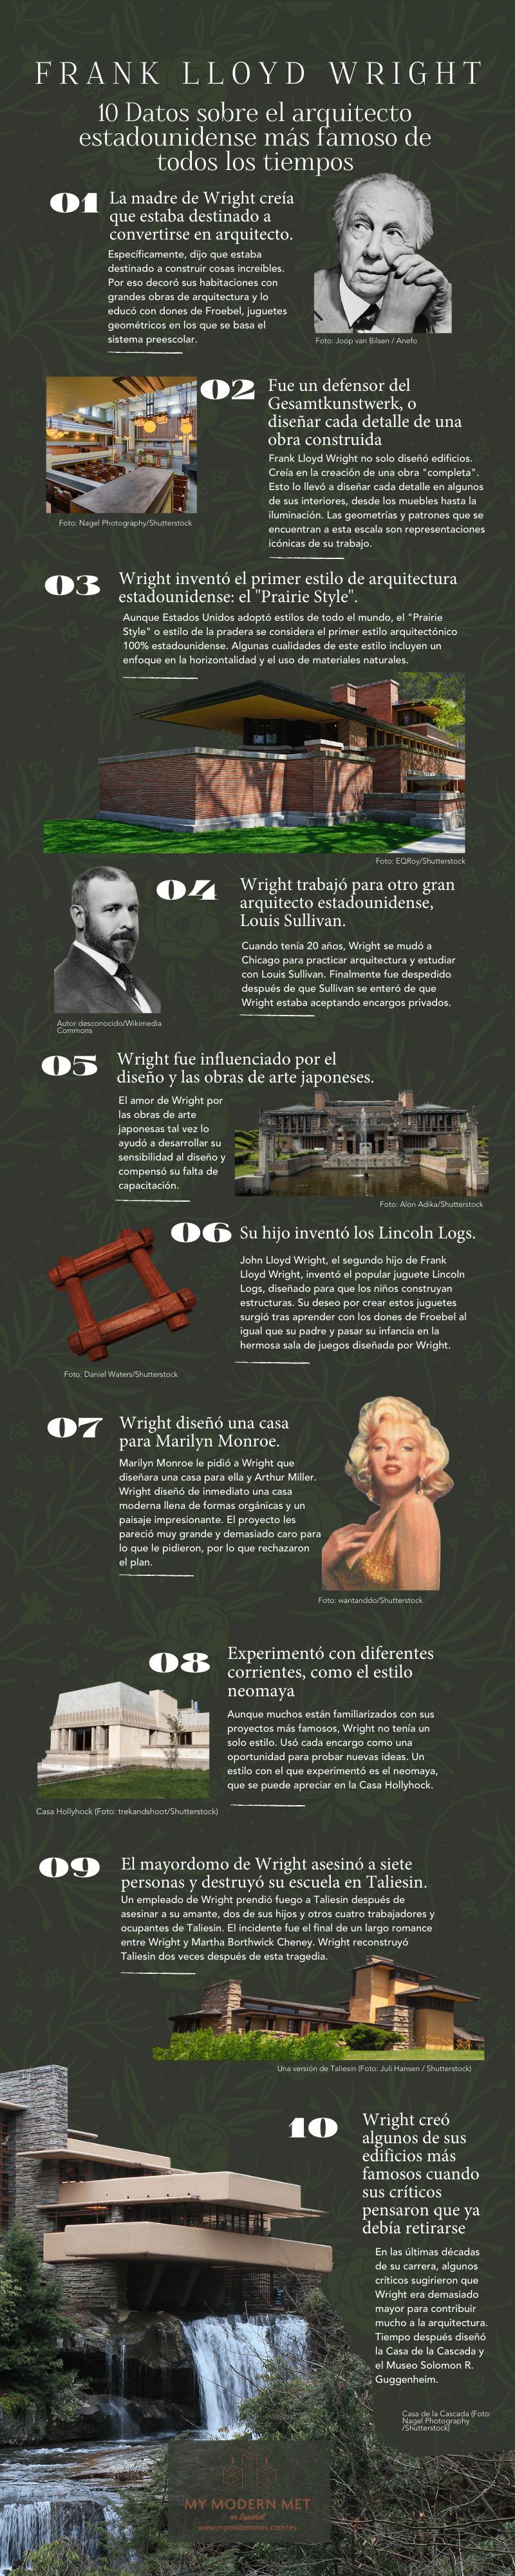 infografía de Frank Lloyd Wright